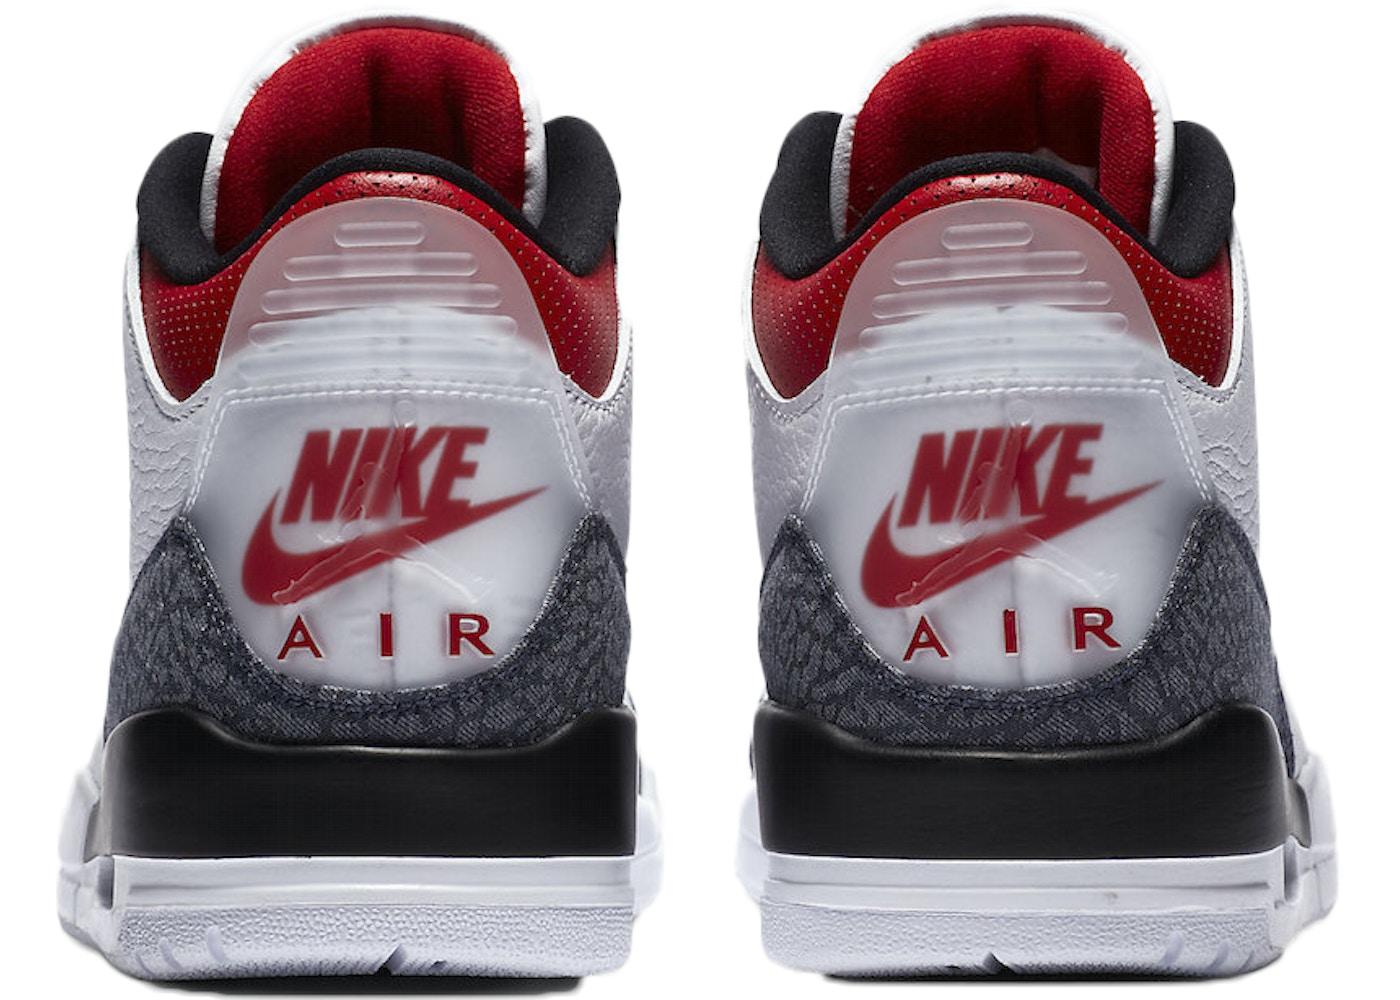 Jordan 3 Retro SE Fire Red Denim (2020)